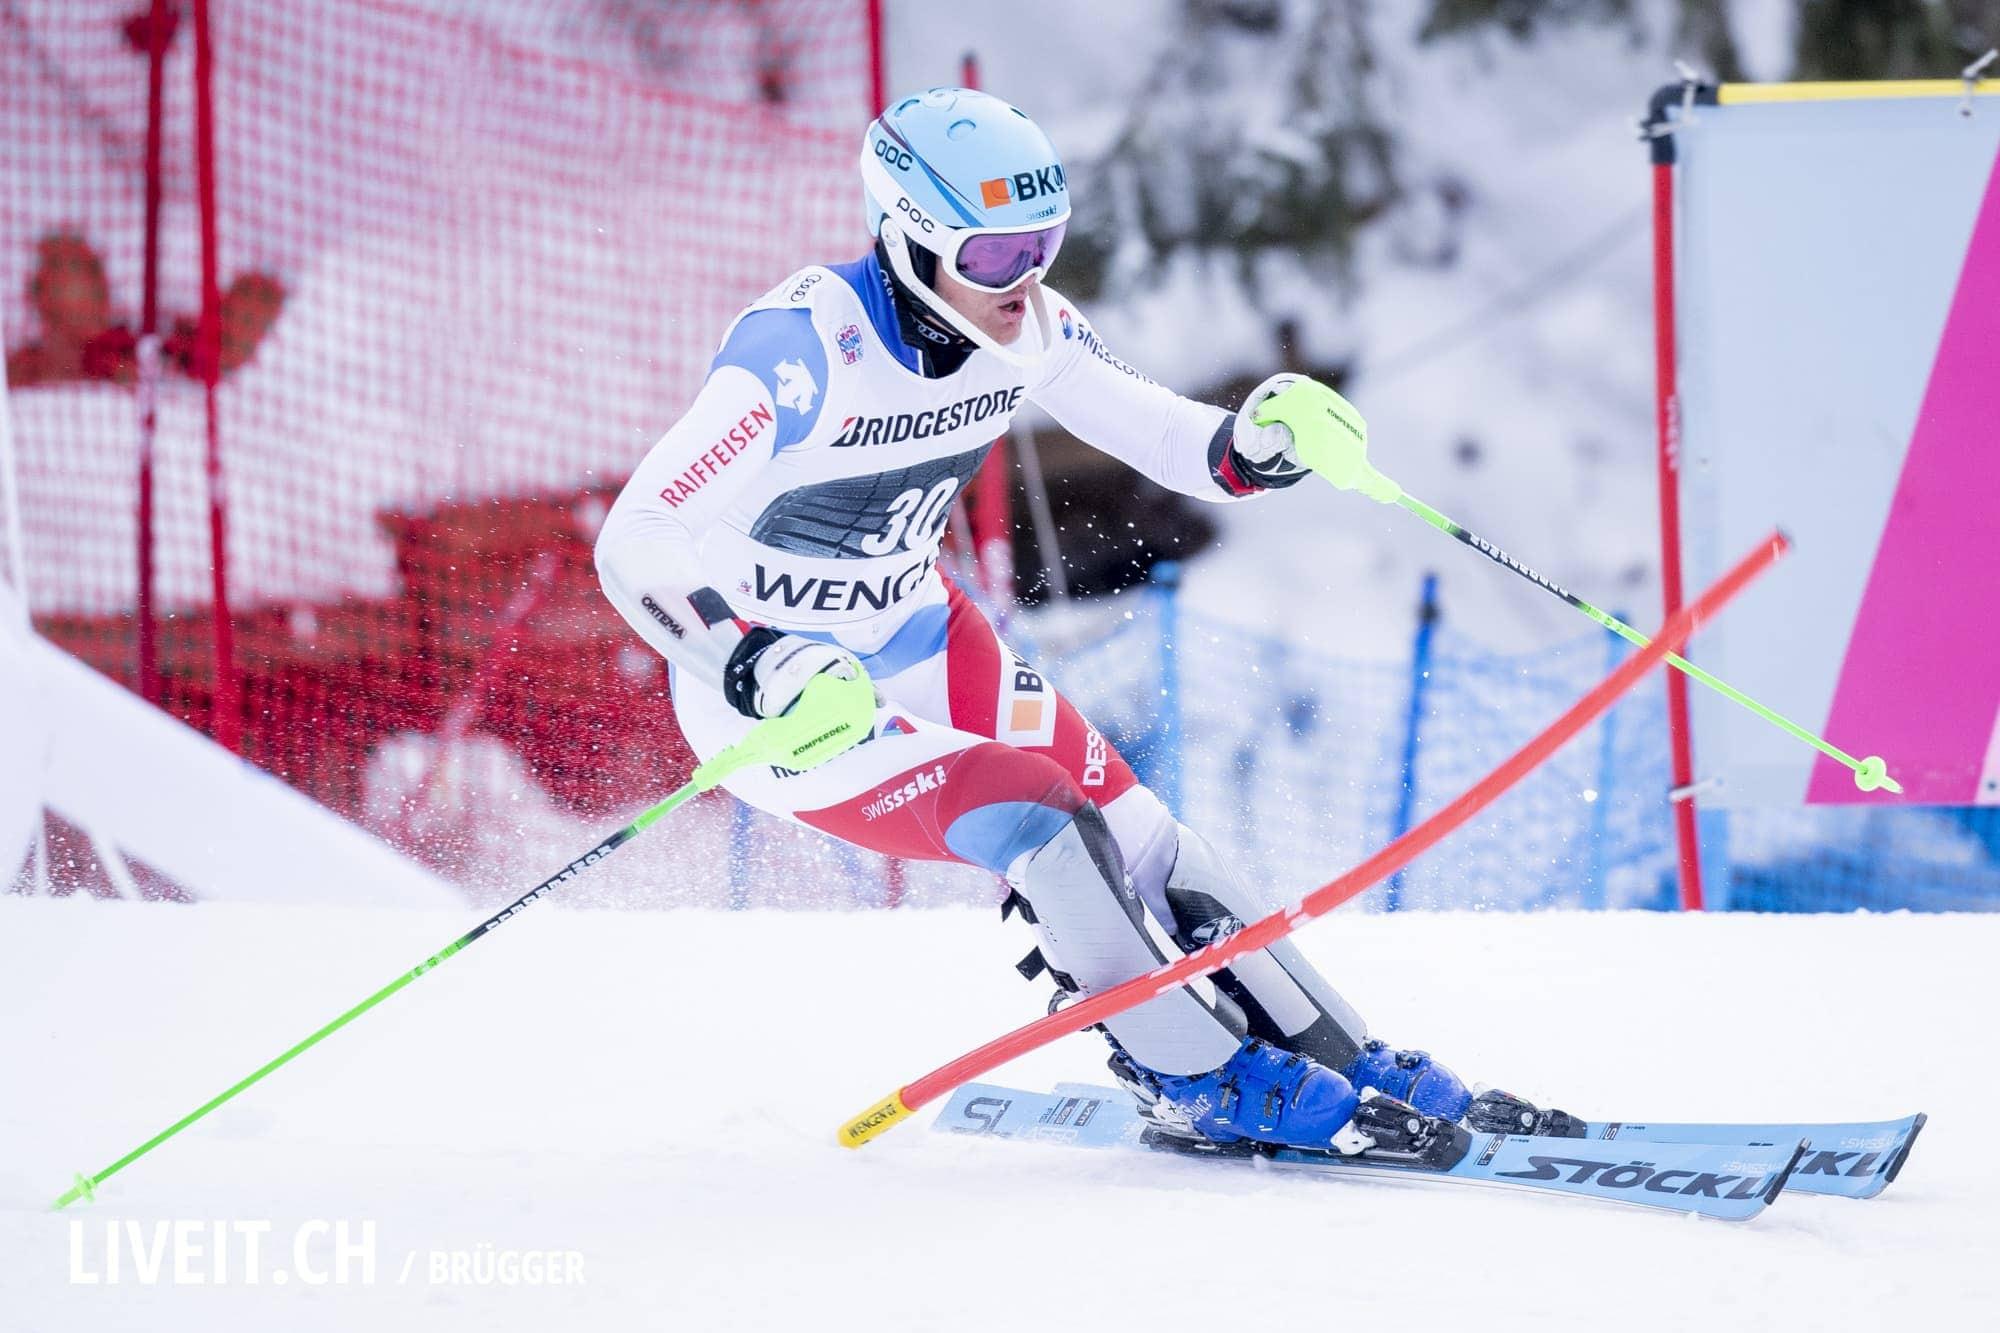 Stefan Rogentin (SUI) fotografiert am Freitag, 18. Januar 2019 am Lauberhornrennen in der Disziplin: Slalom Alpine Kombination. (Fotografiert von Dominic Bruegger liveit.ch)